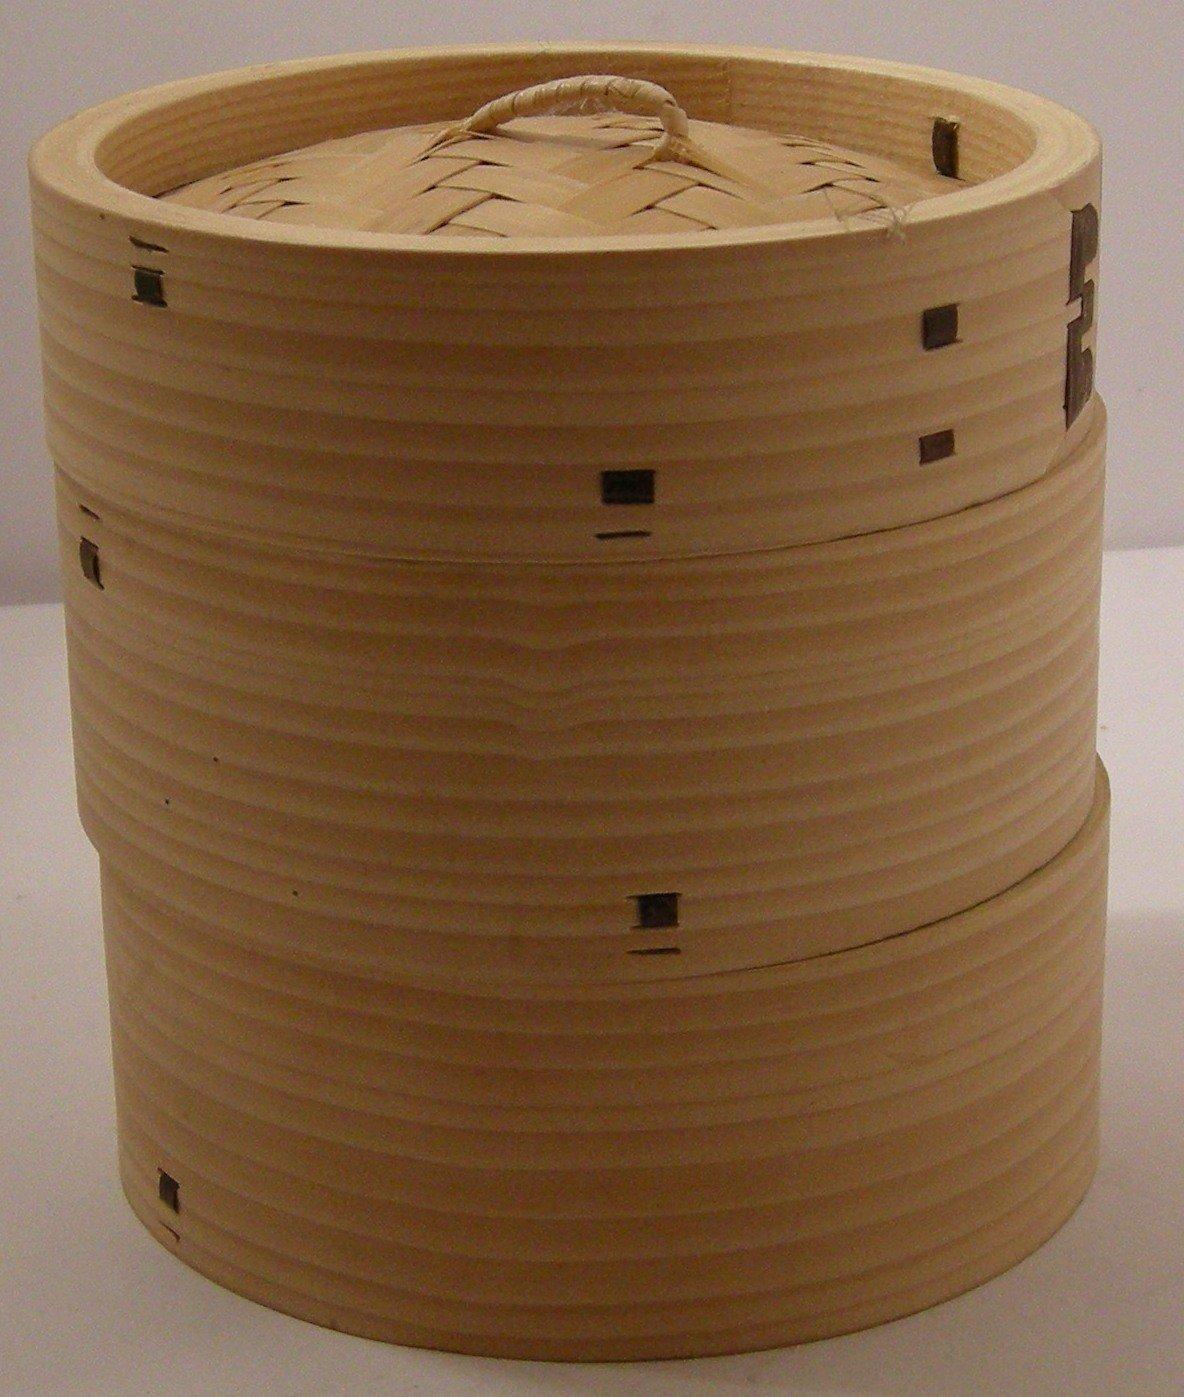 Dampfgarer - Bambus - 3-teilig - Ø 13 cm - hochwertig Cookware company